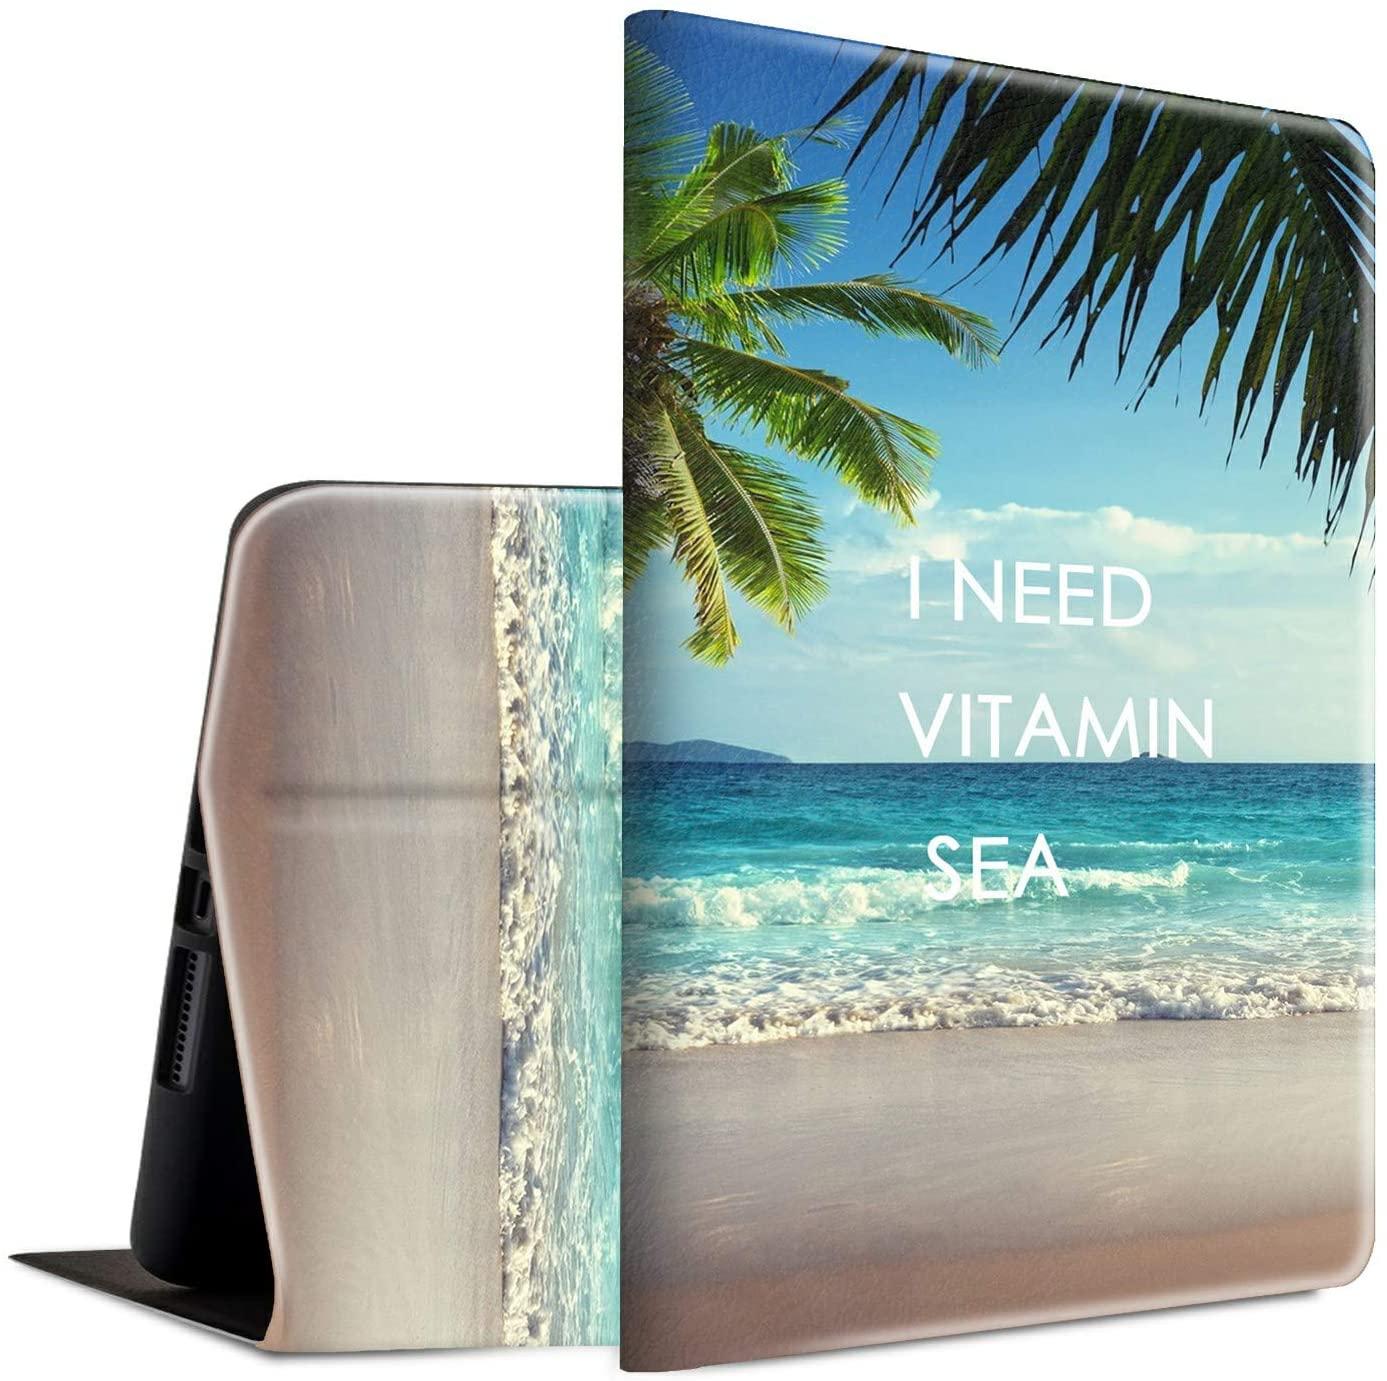 New iPad Pro 11 Case 2020, Spsun Lightweight PU Leather Folio Adjustable Stand with Auto Wake/Sleep Smart Protect Case for Apple iPad Pro 11 inch 2nd Generation - I Need Vitamin Sea Palm Tree